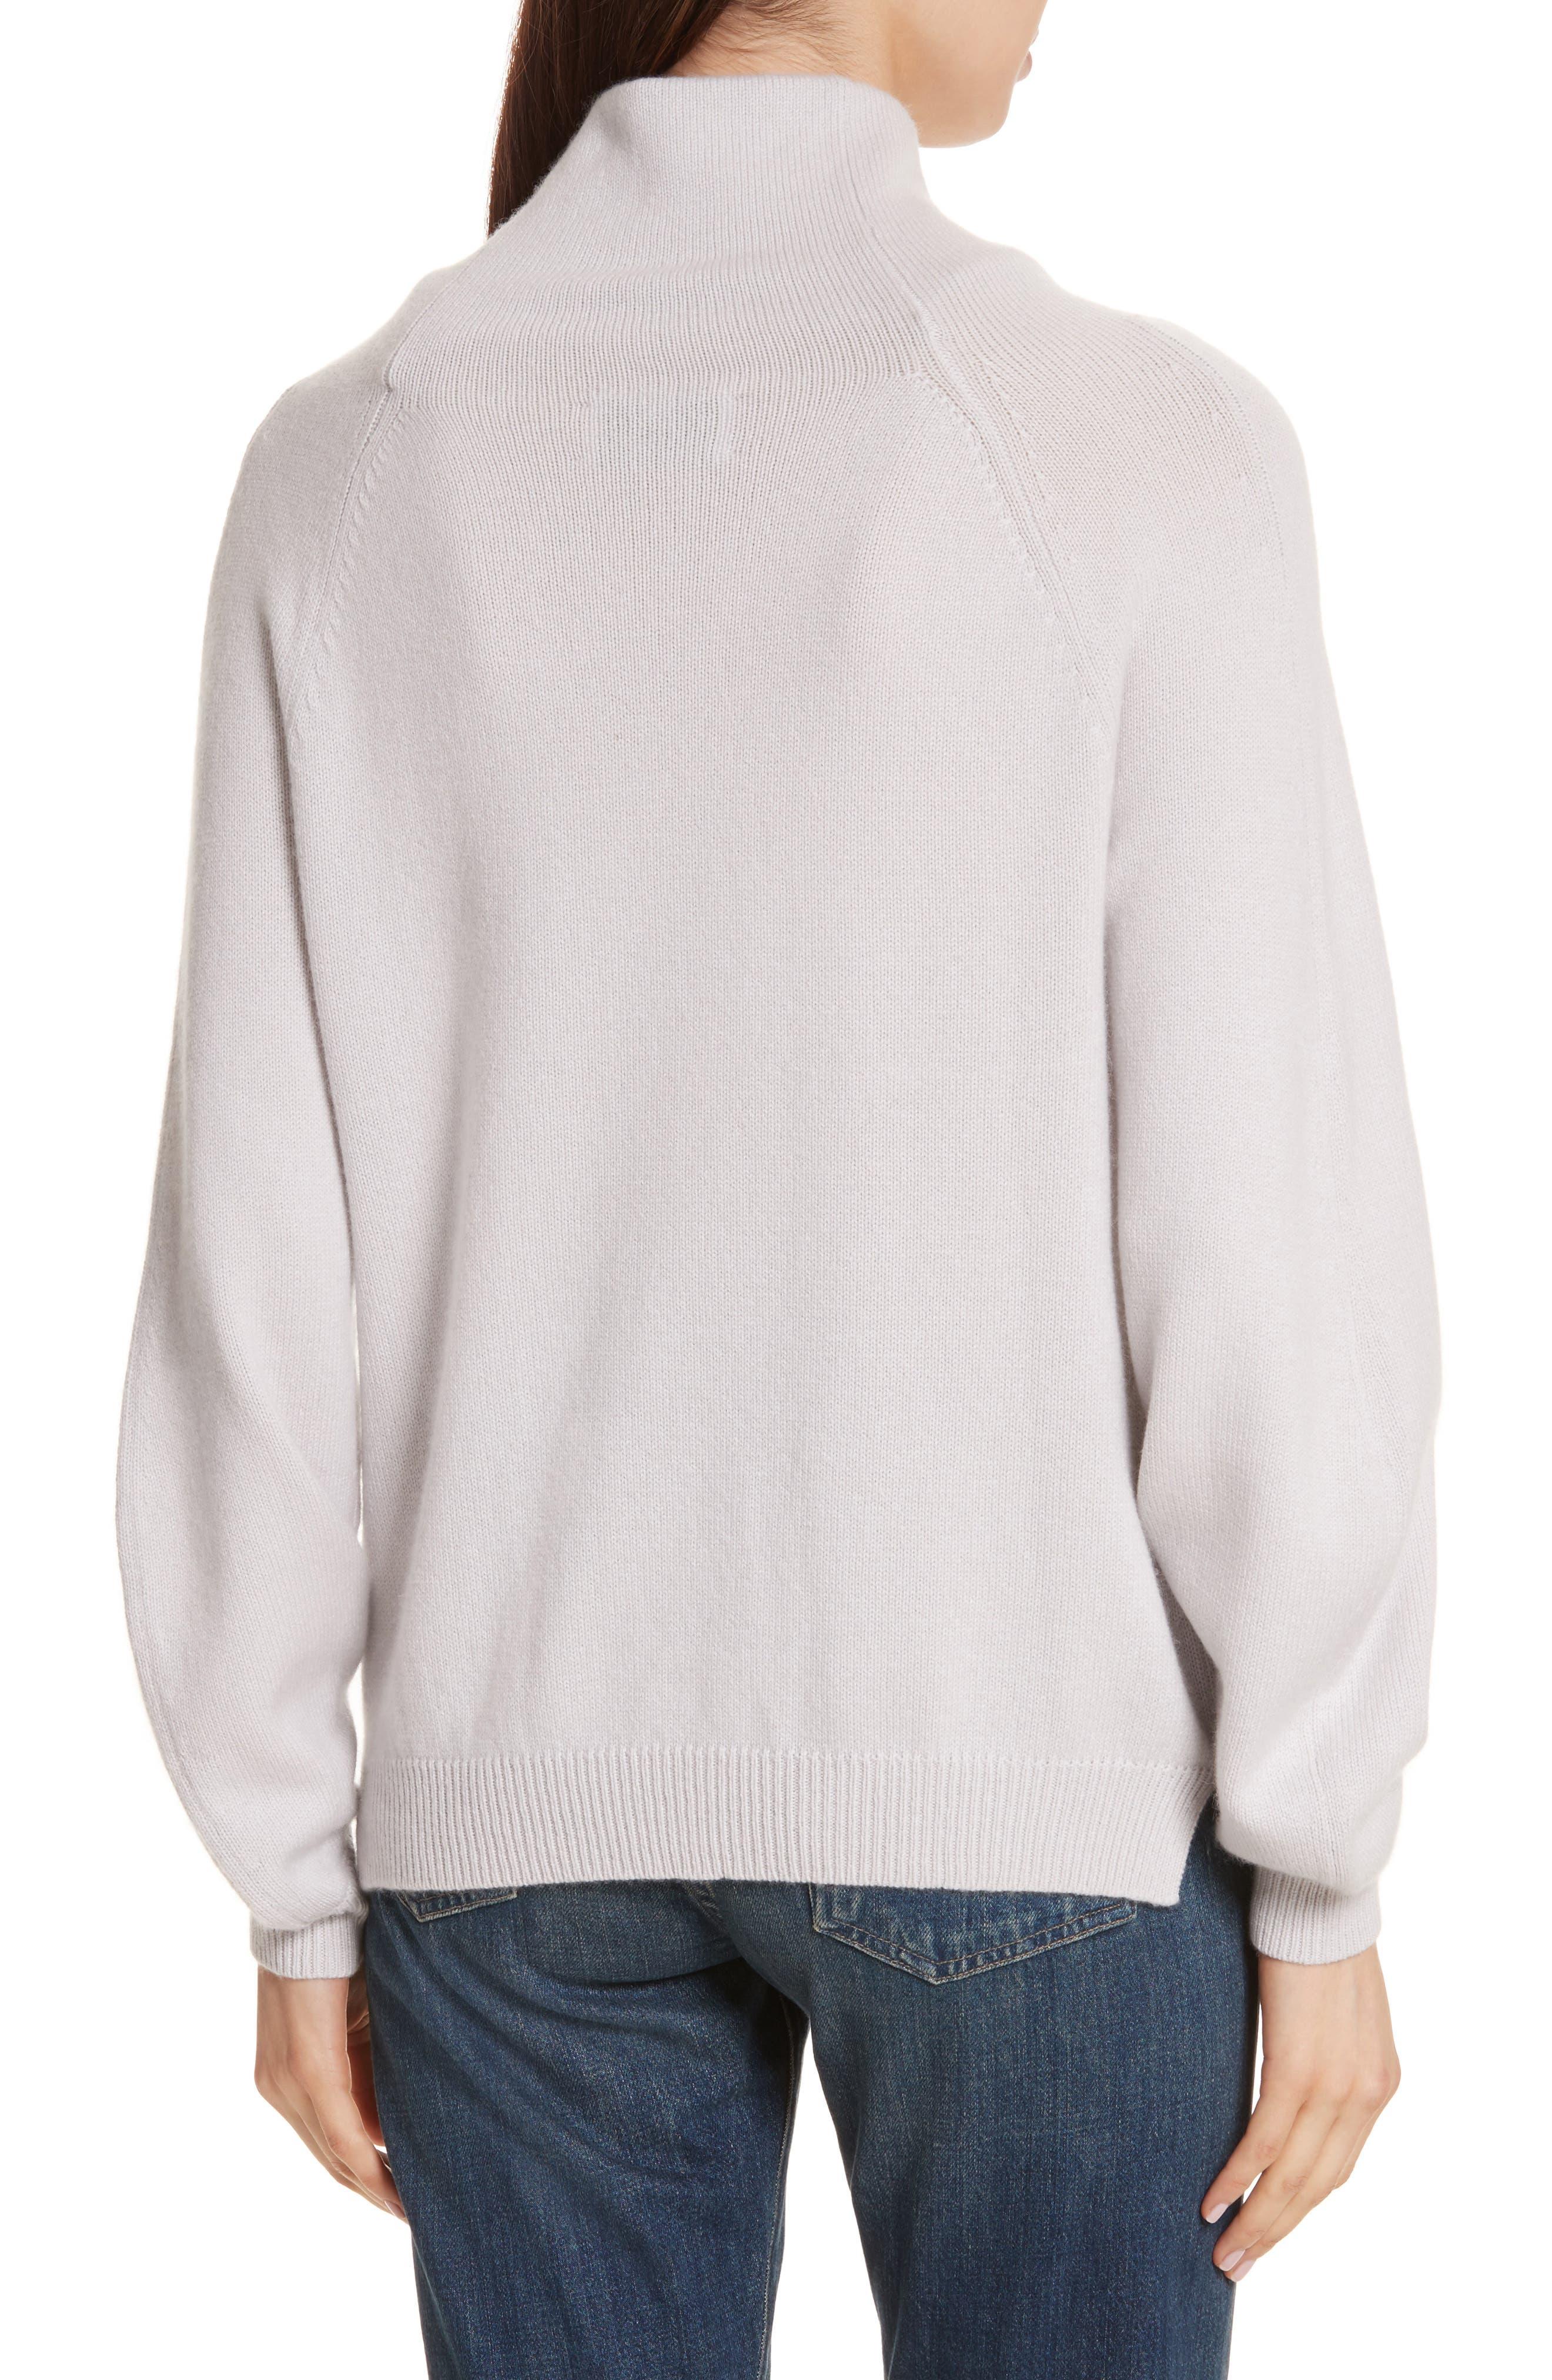 Balloon Sleeve Cashmere Turtleneck Sweater,                             Alternate thumbnail 2, color,                             020